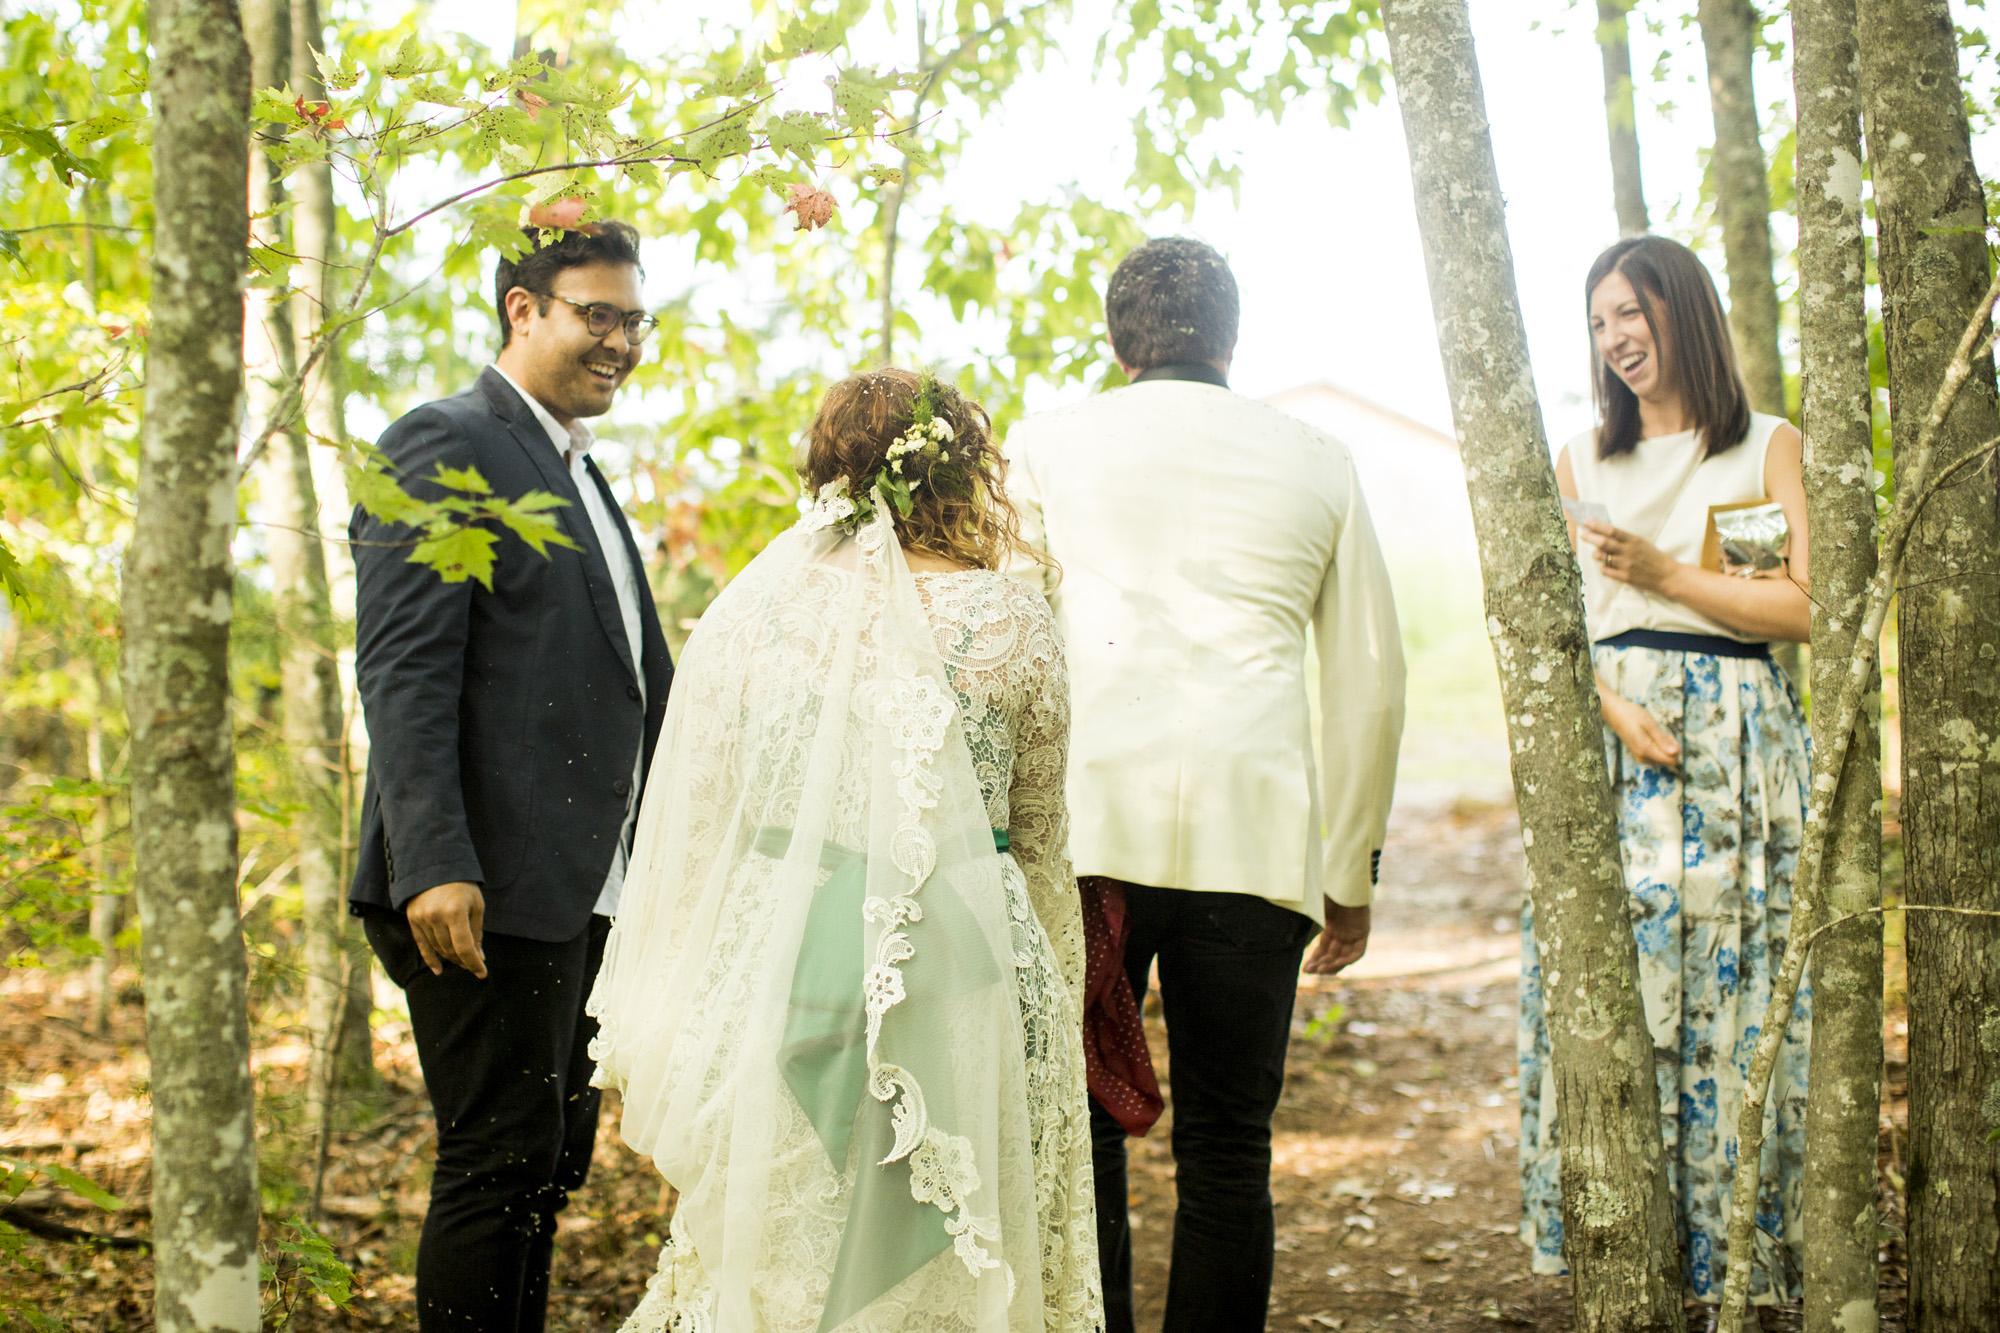 Seriously_Sabrina_Photography_Red_River_Gorge_Kentucky_Wedding_ShawnDana136.jpg